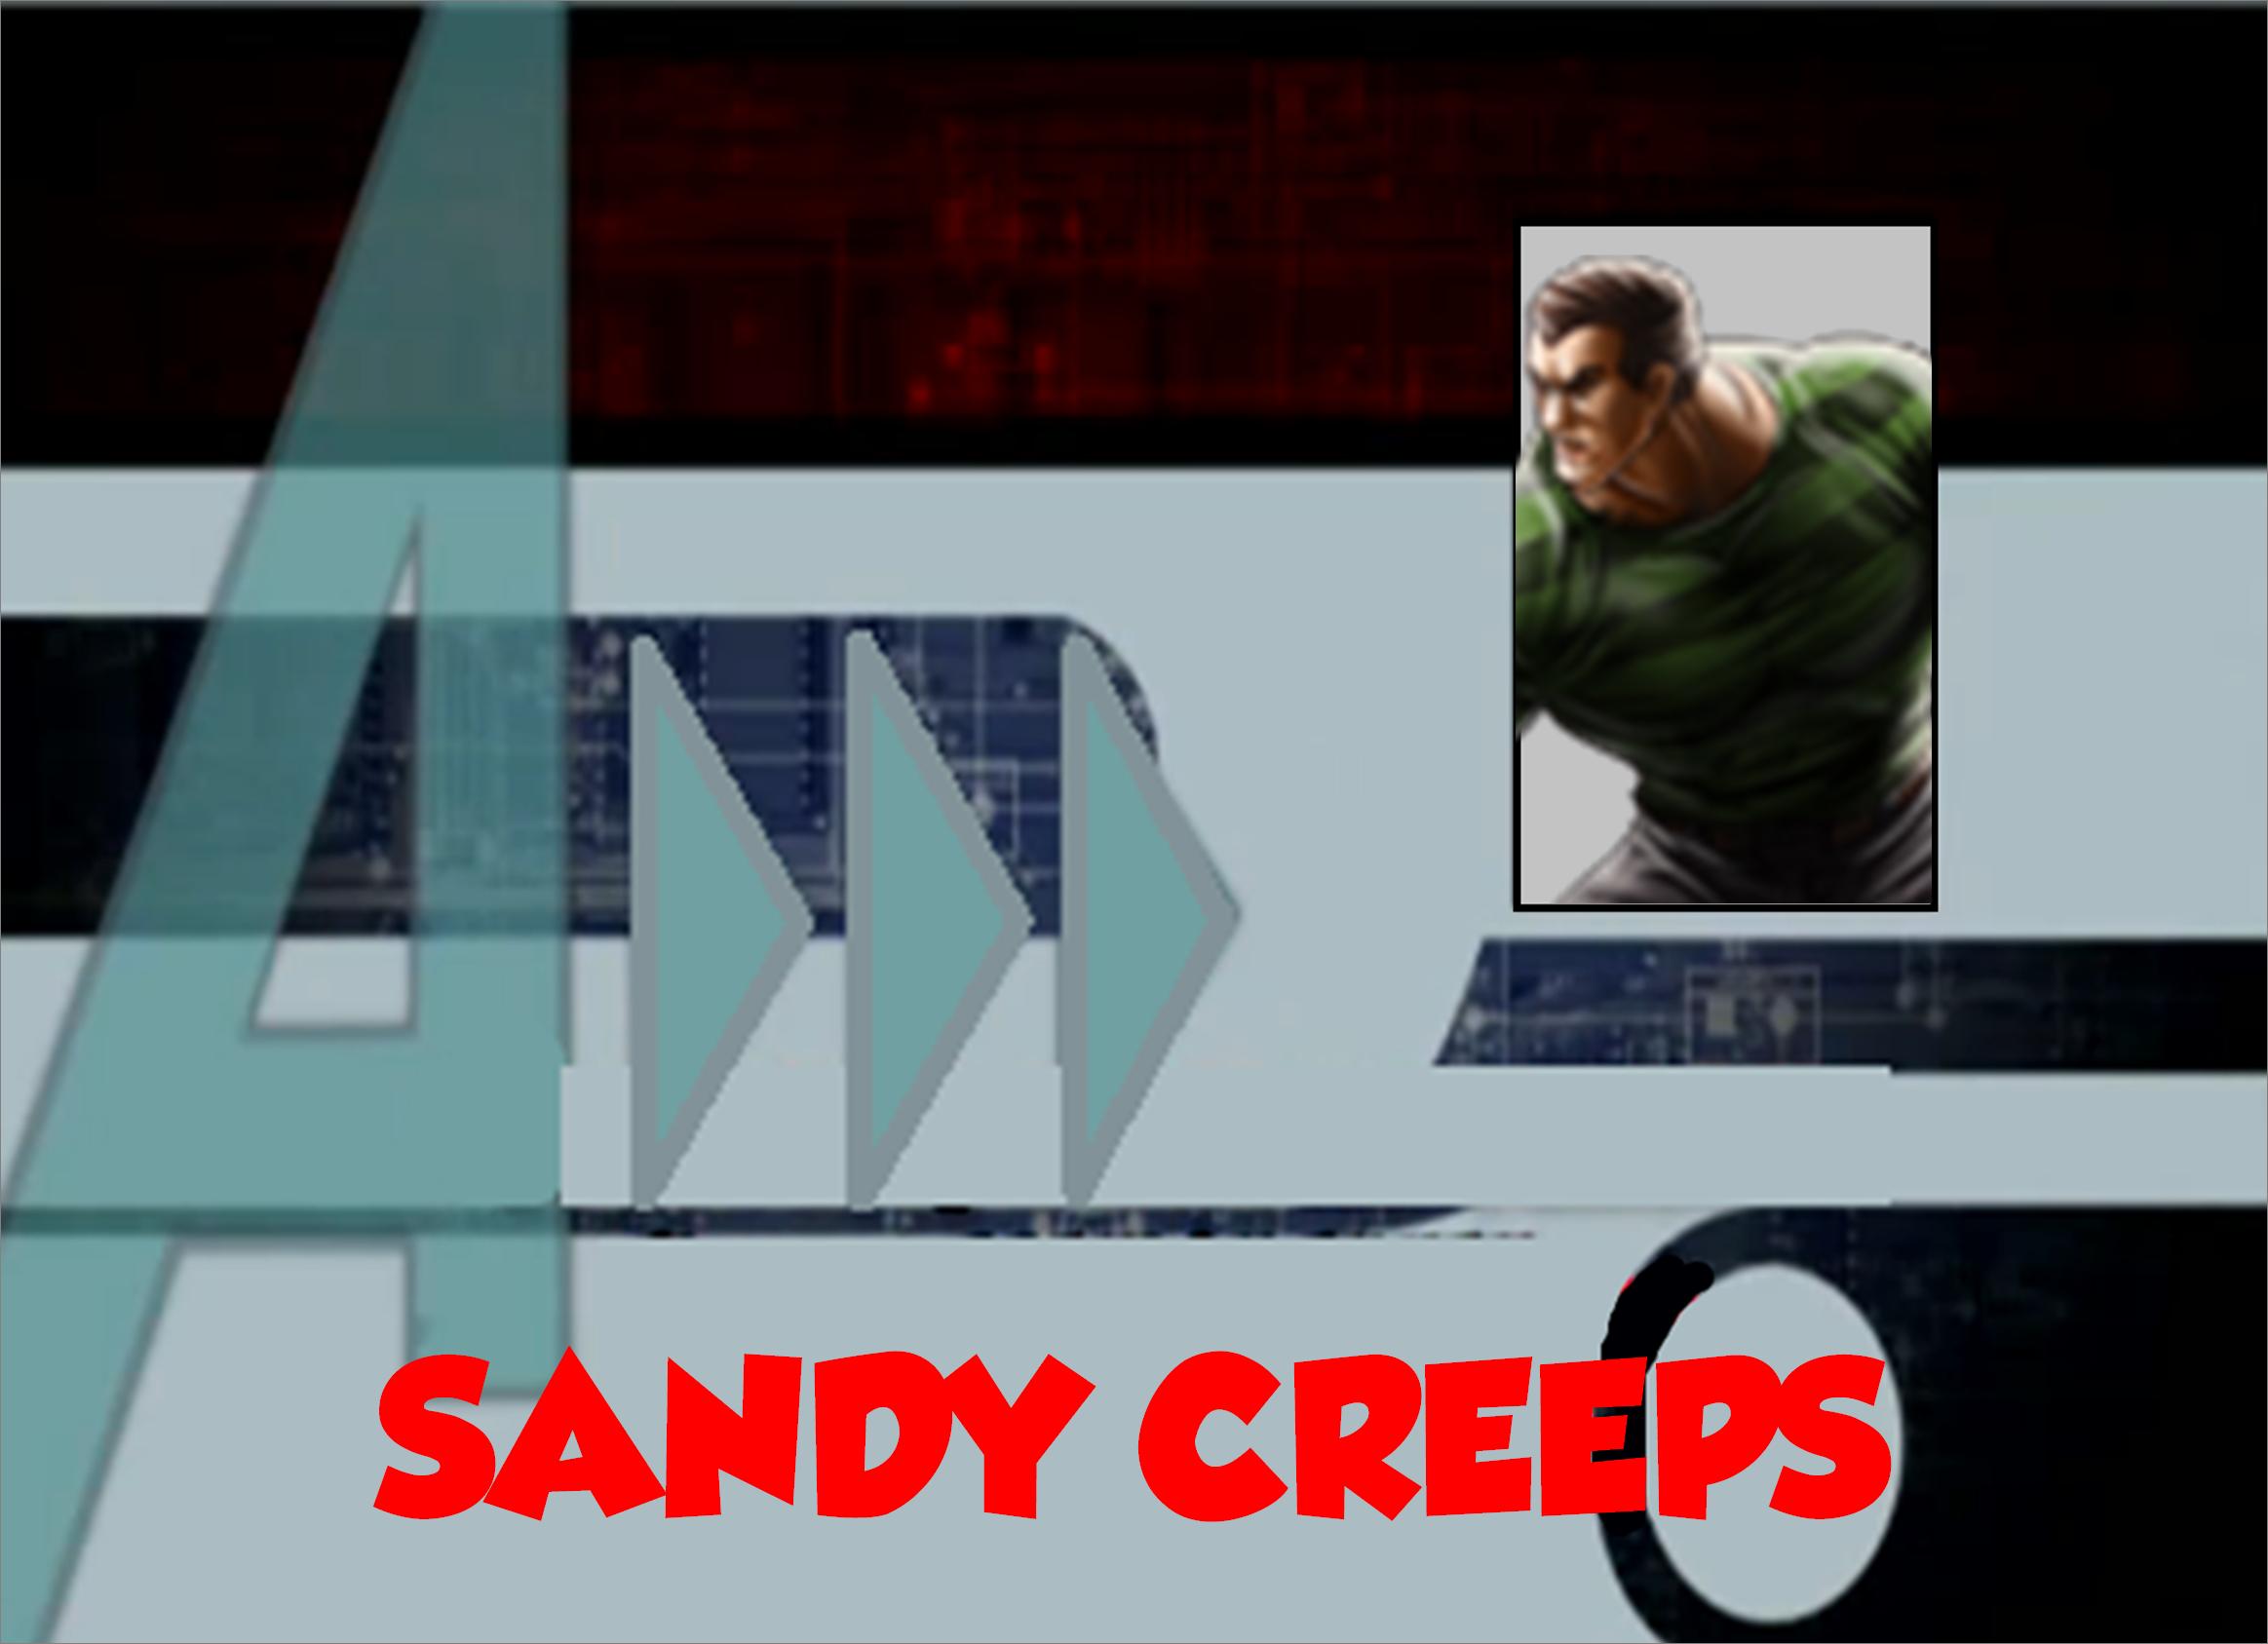 Sandy Creeps (A!)